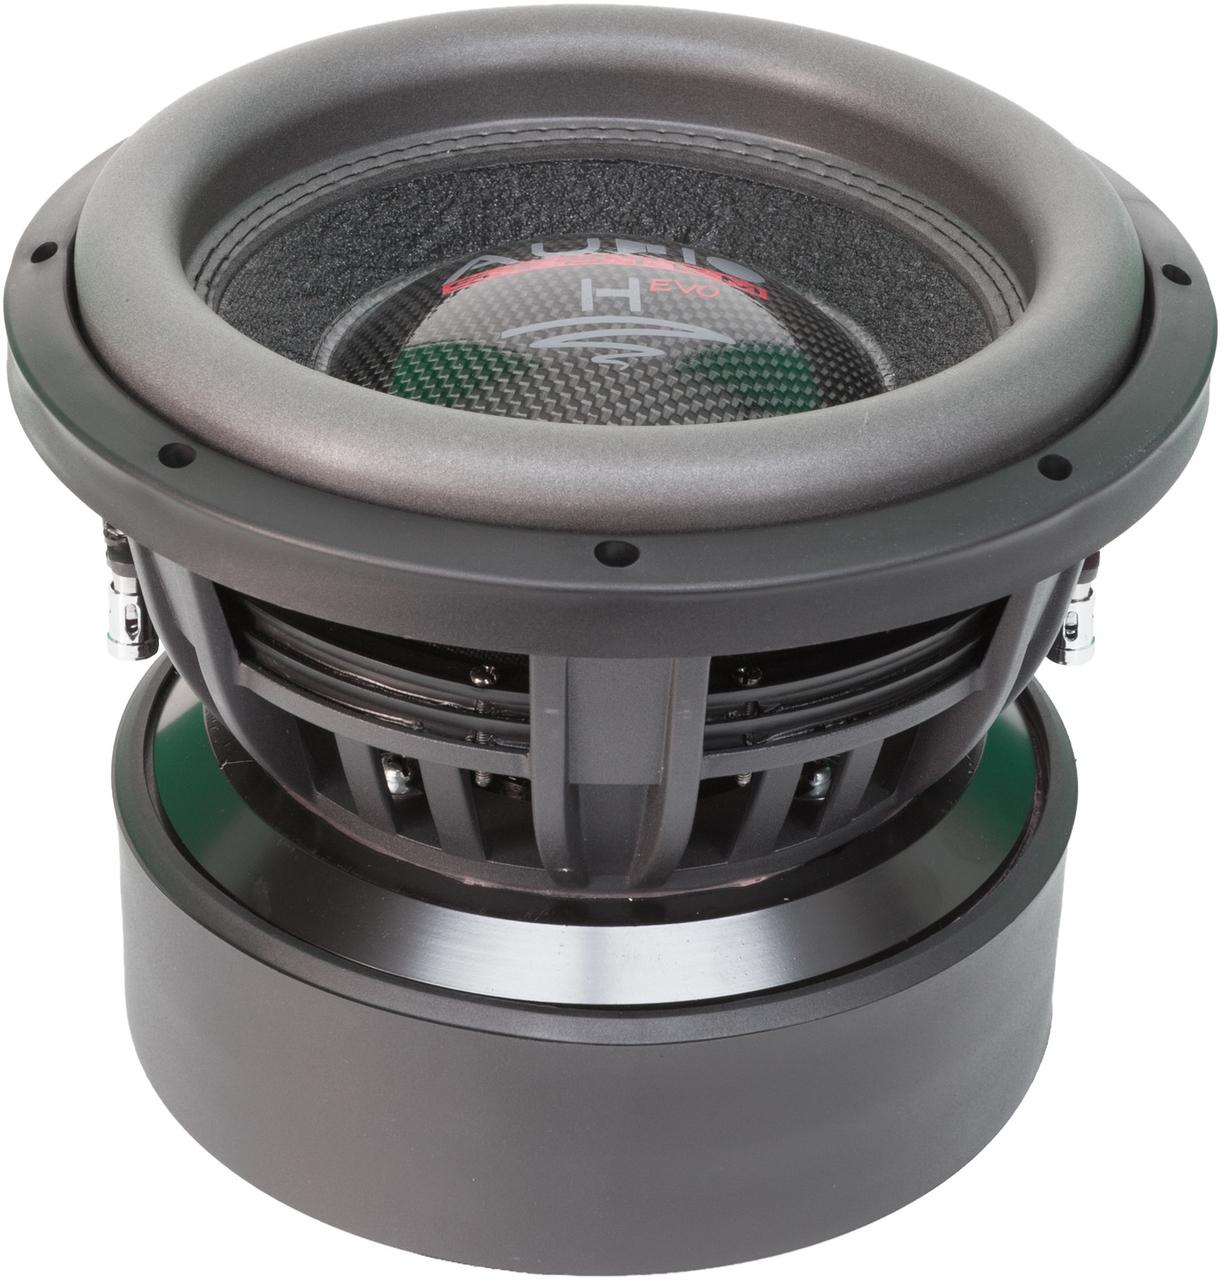 Audio System H10 Evo Subwoofer 10 Inch 2000 Watts Rms Dvc 2 Ohms Car Hifi Twente